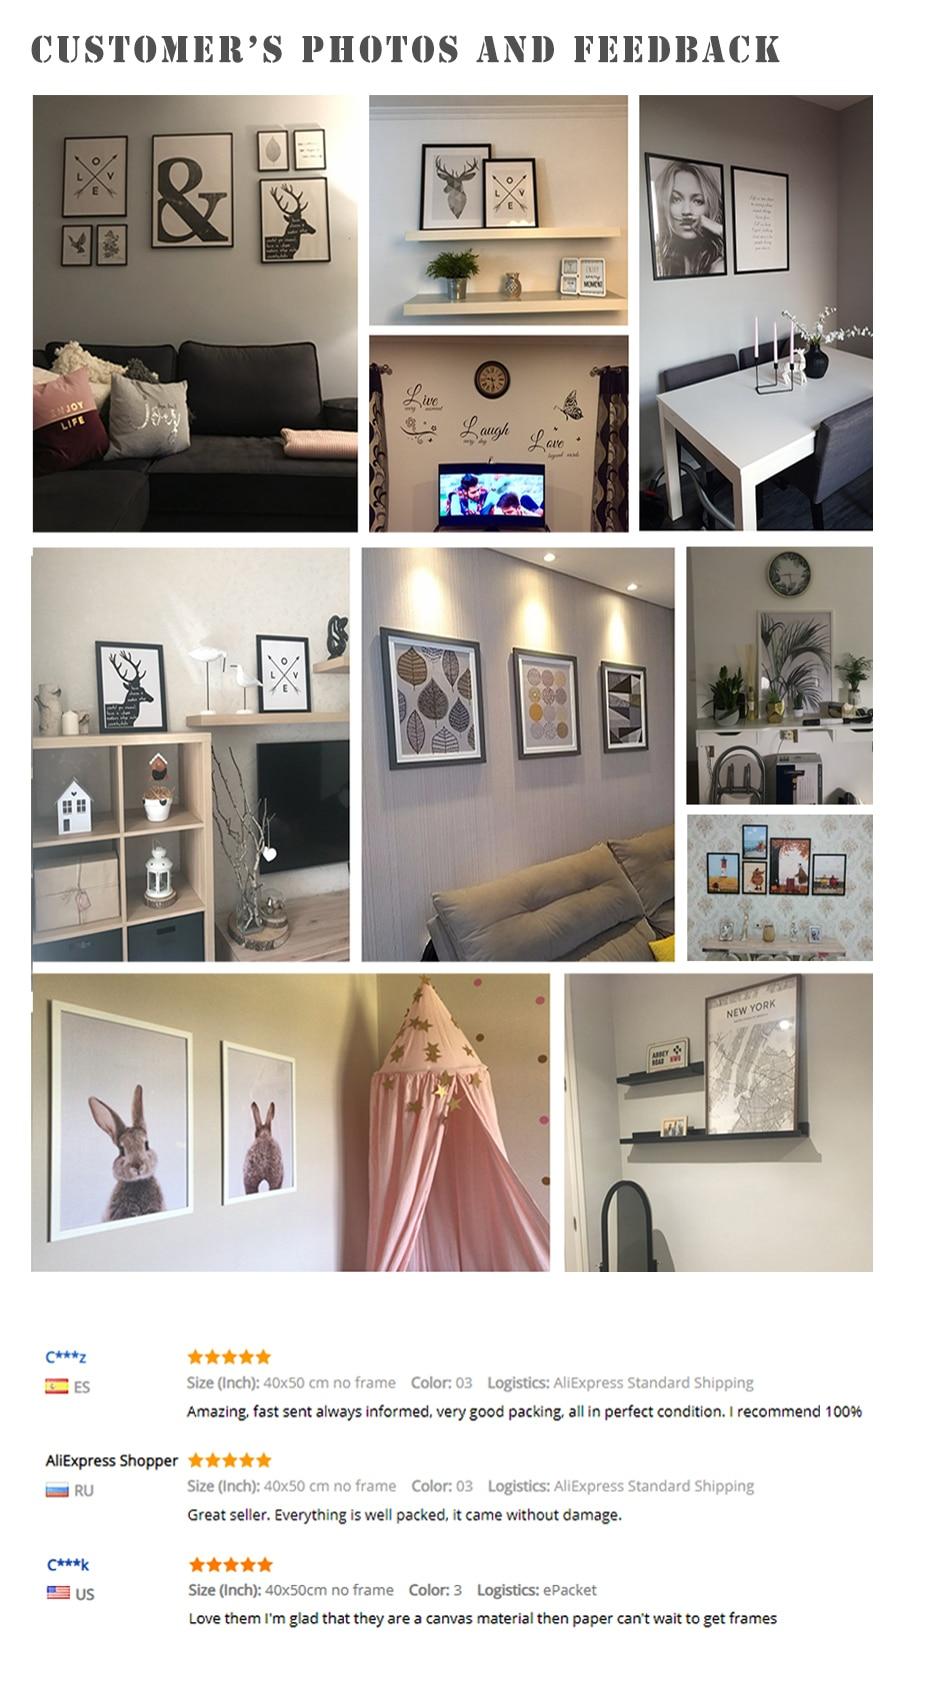 HTB1U3dCS3HqK1RjSZFgq6y7JXXaU Abstract Modern Fashion Make Up Canvas Painting Black White Salon Posters Prints Nordic Wall Art Pictures Living Room Home Decor